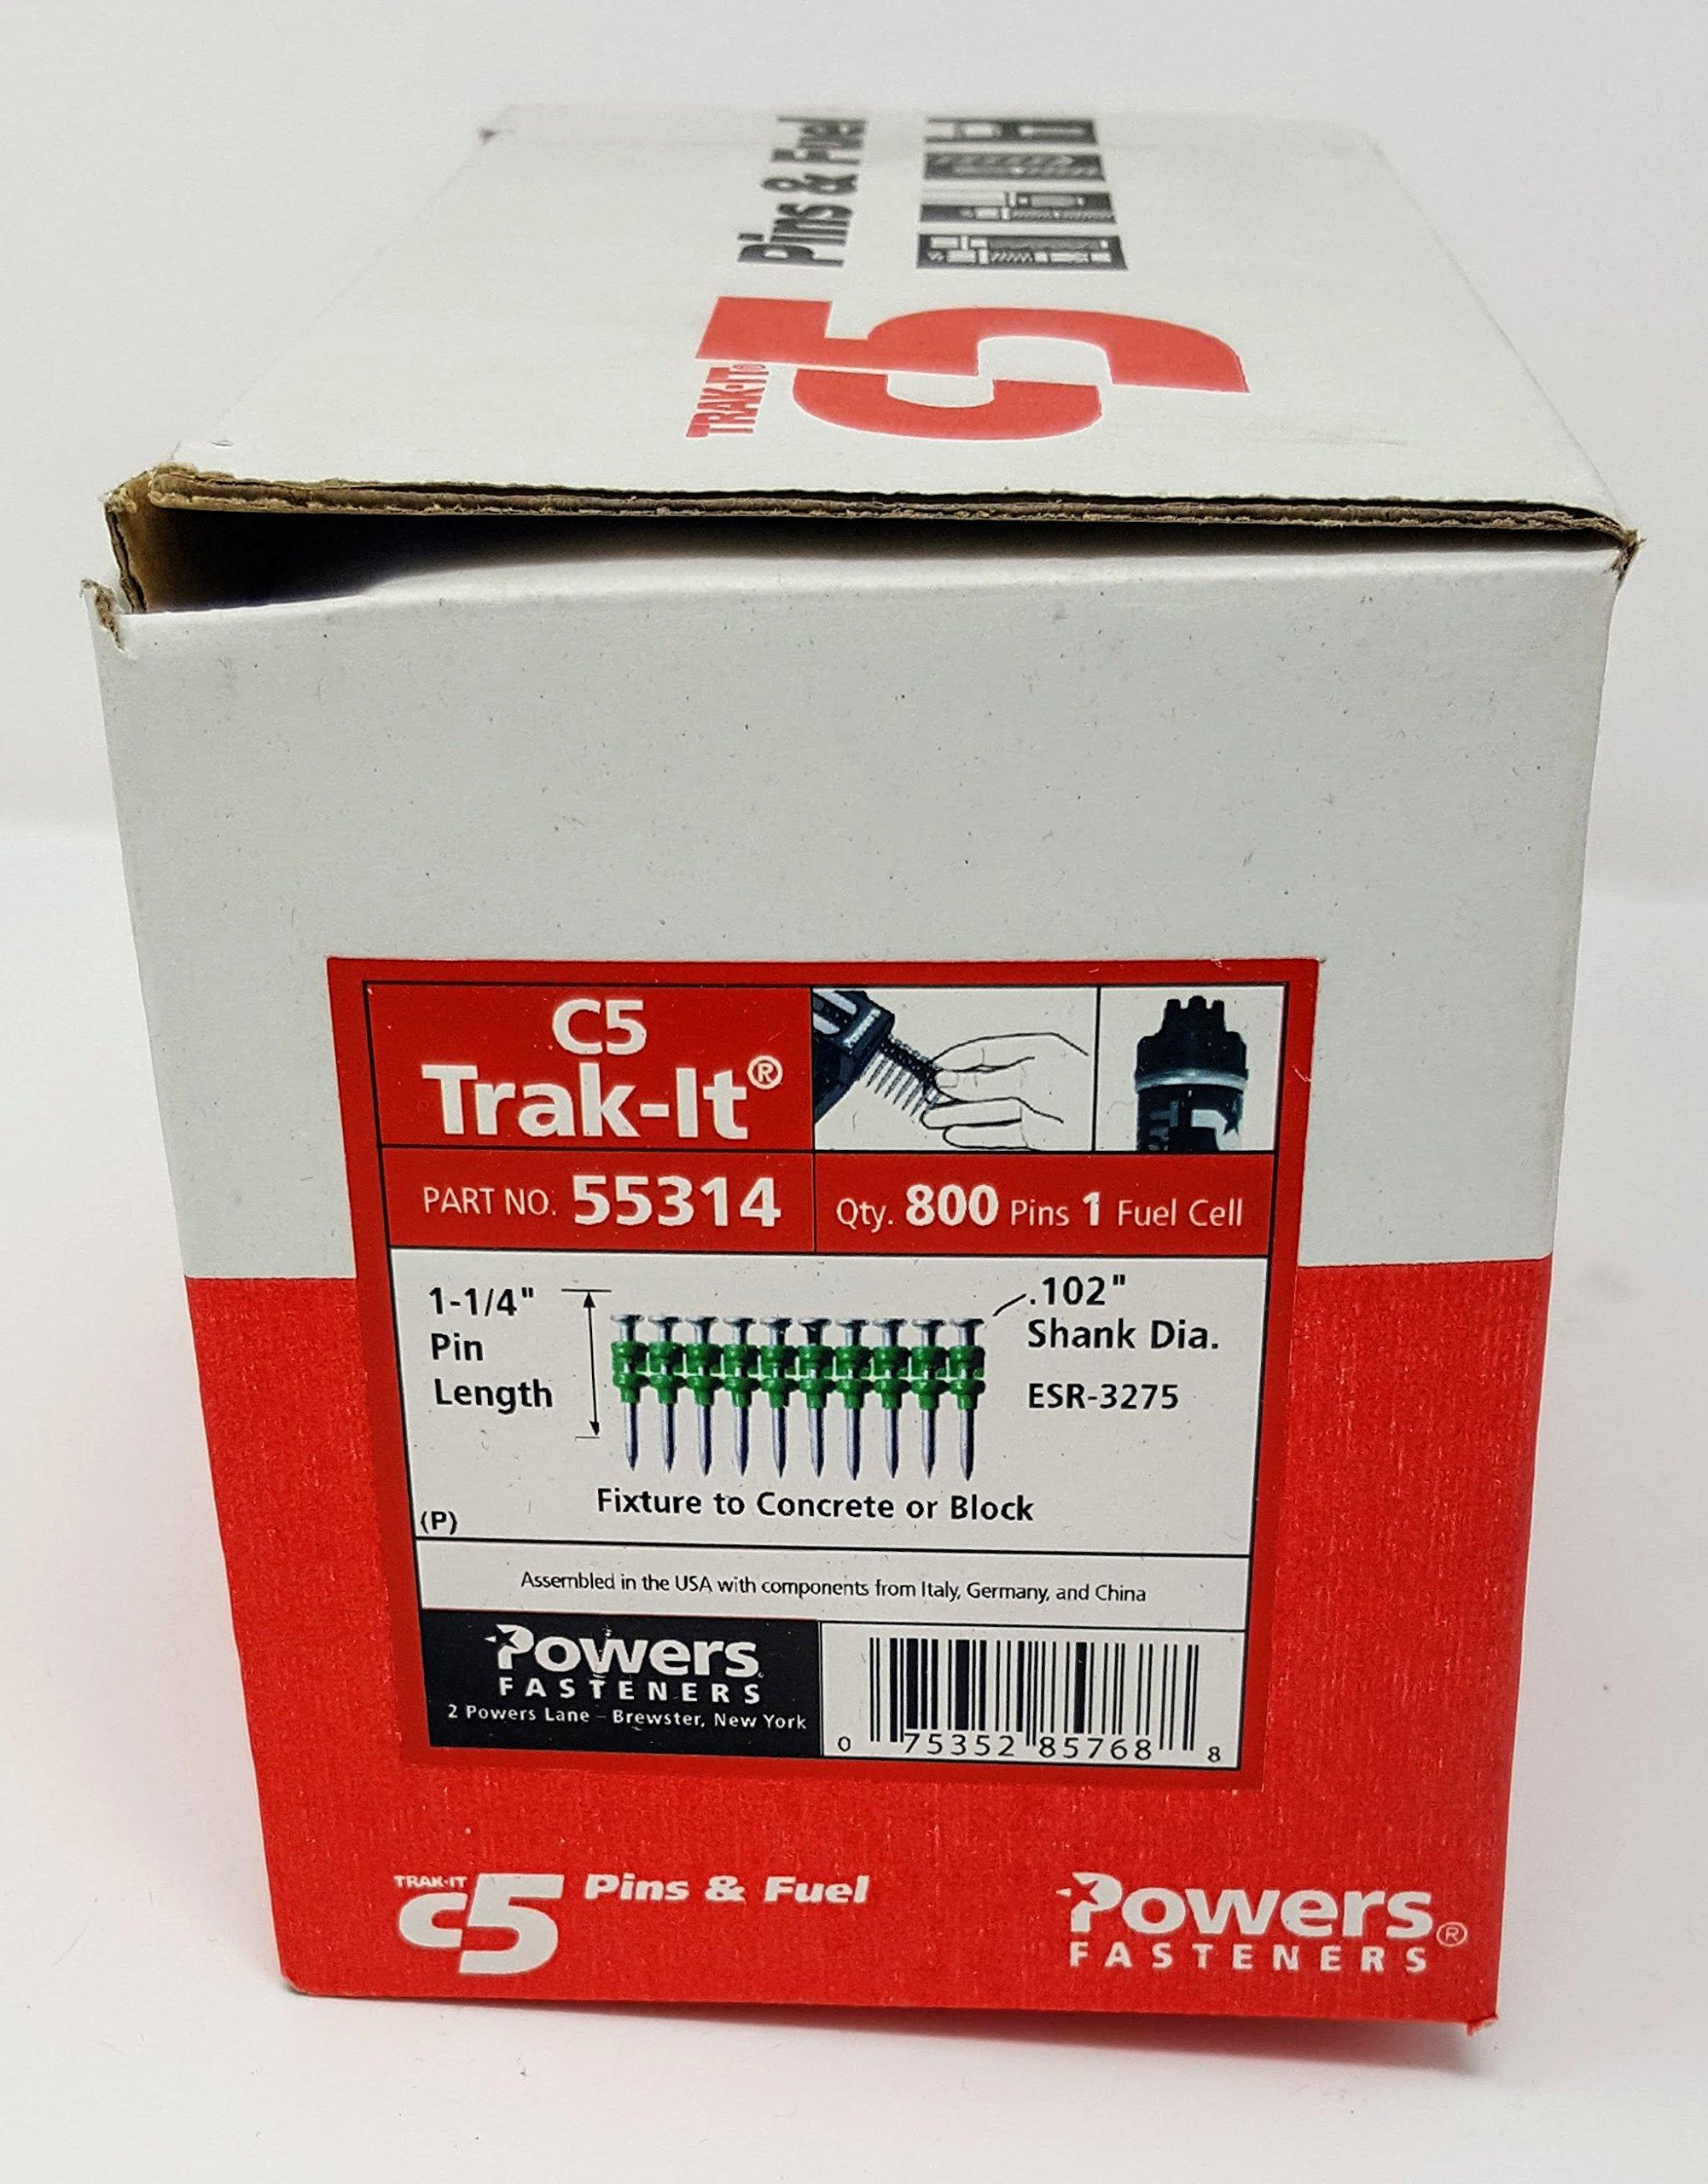 Powers C5 Pin ST .102 x 1-1/4 ZP (800 Each) 55314